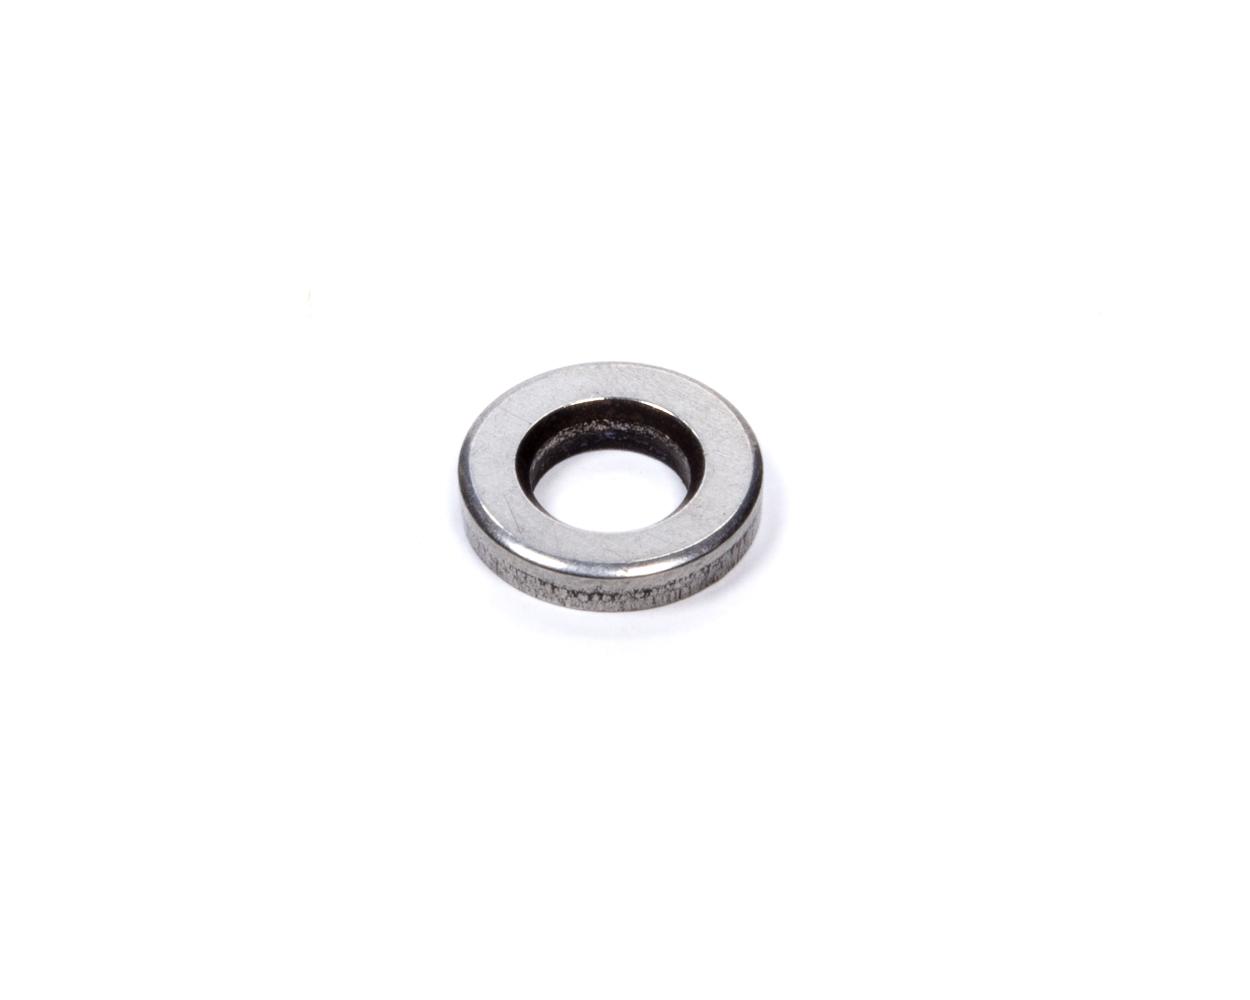 Arp S/S Flat Washers - 5/16 ID x .625 OD (1pk)